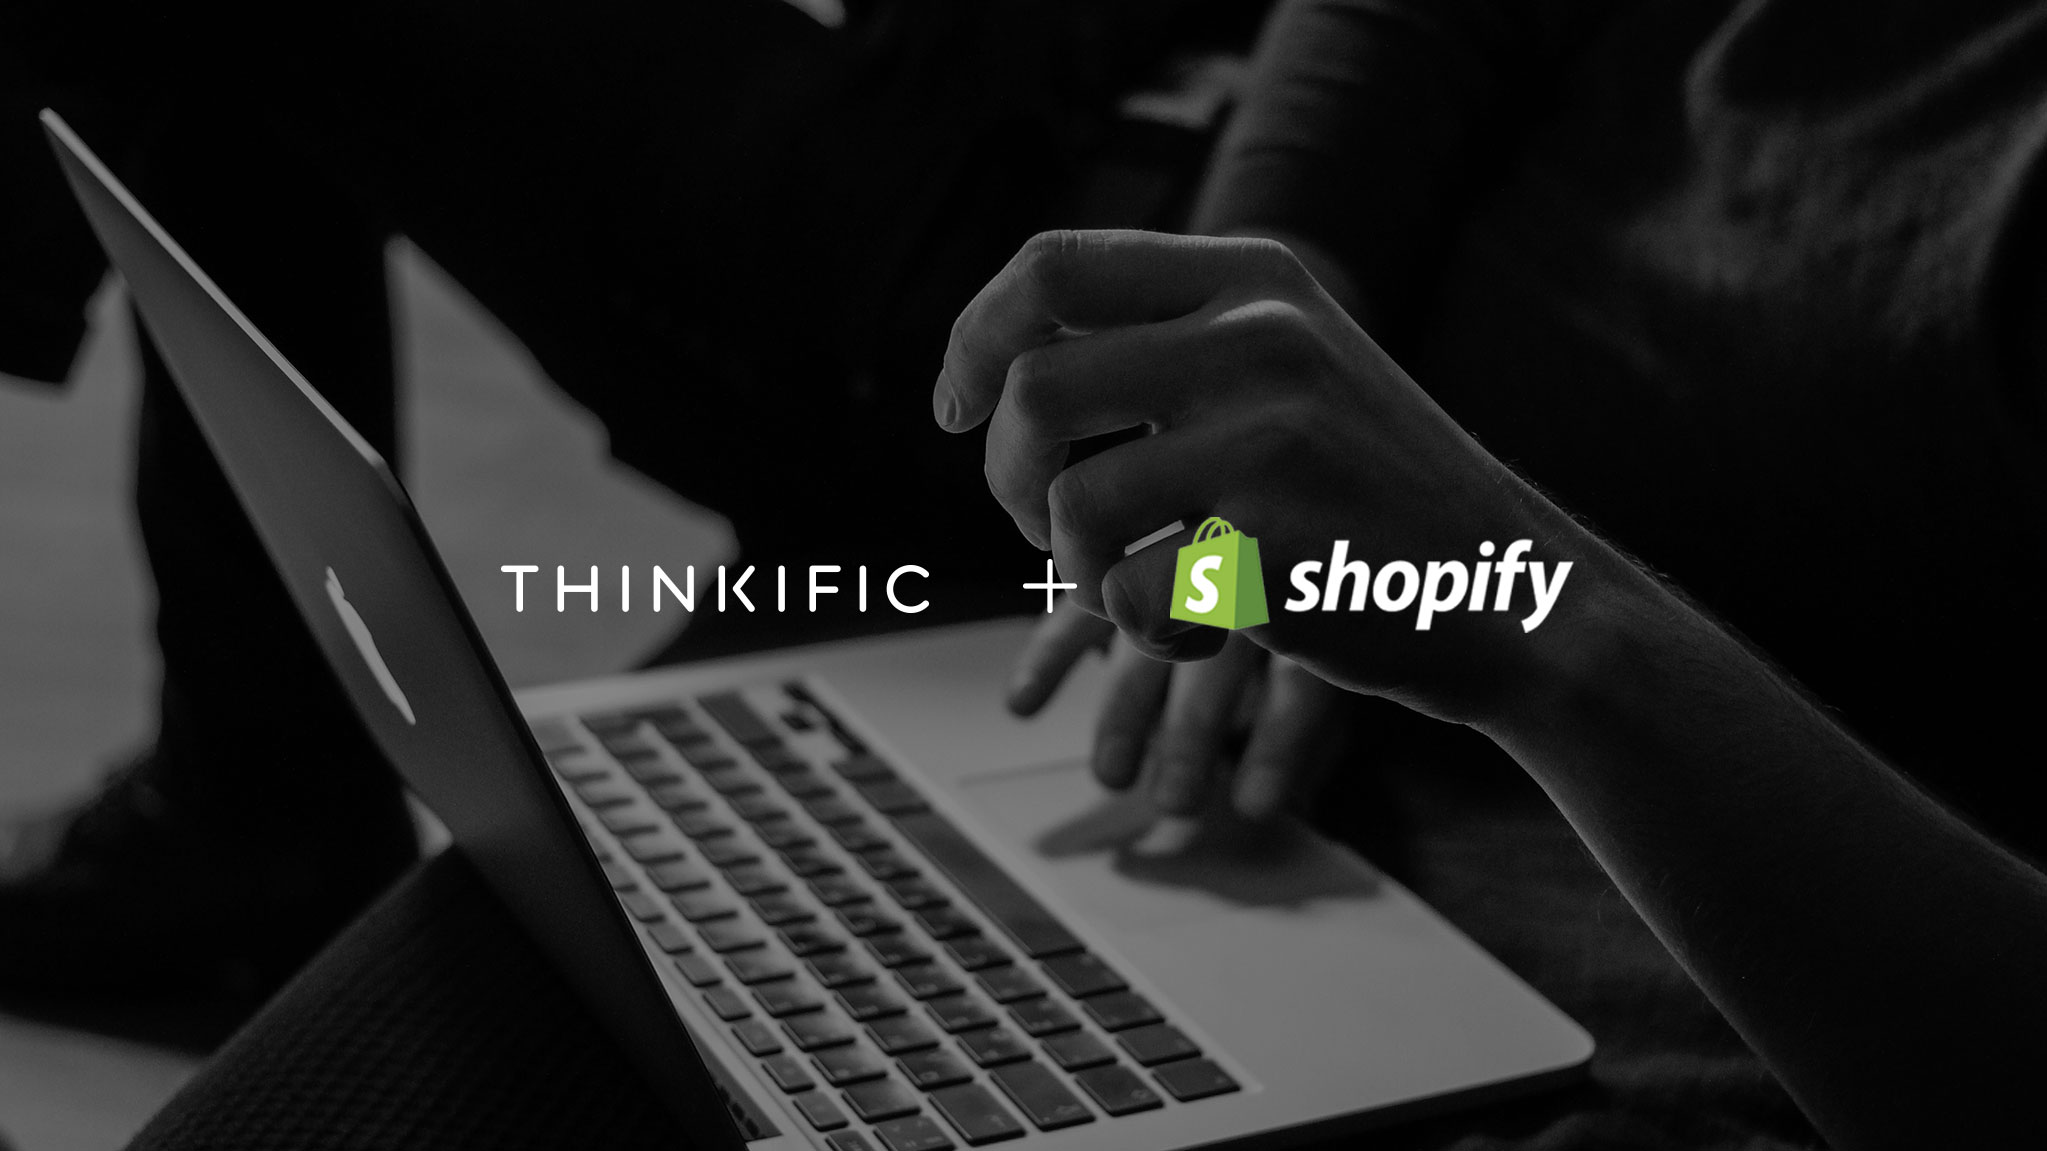 Thinkific + Shopify